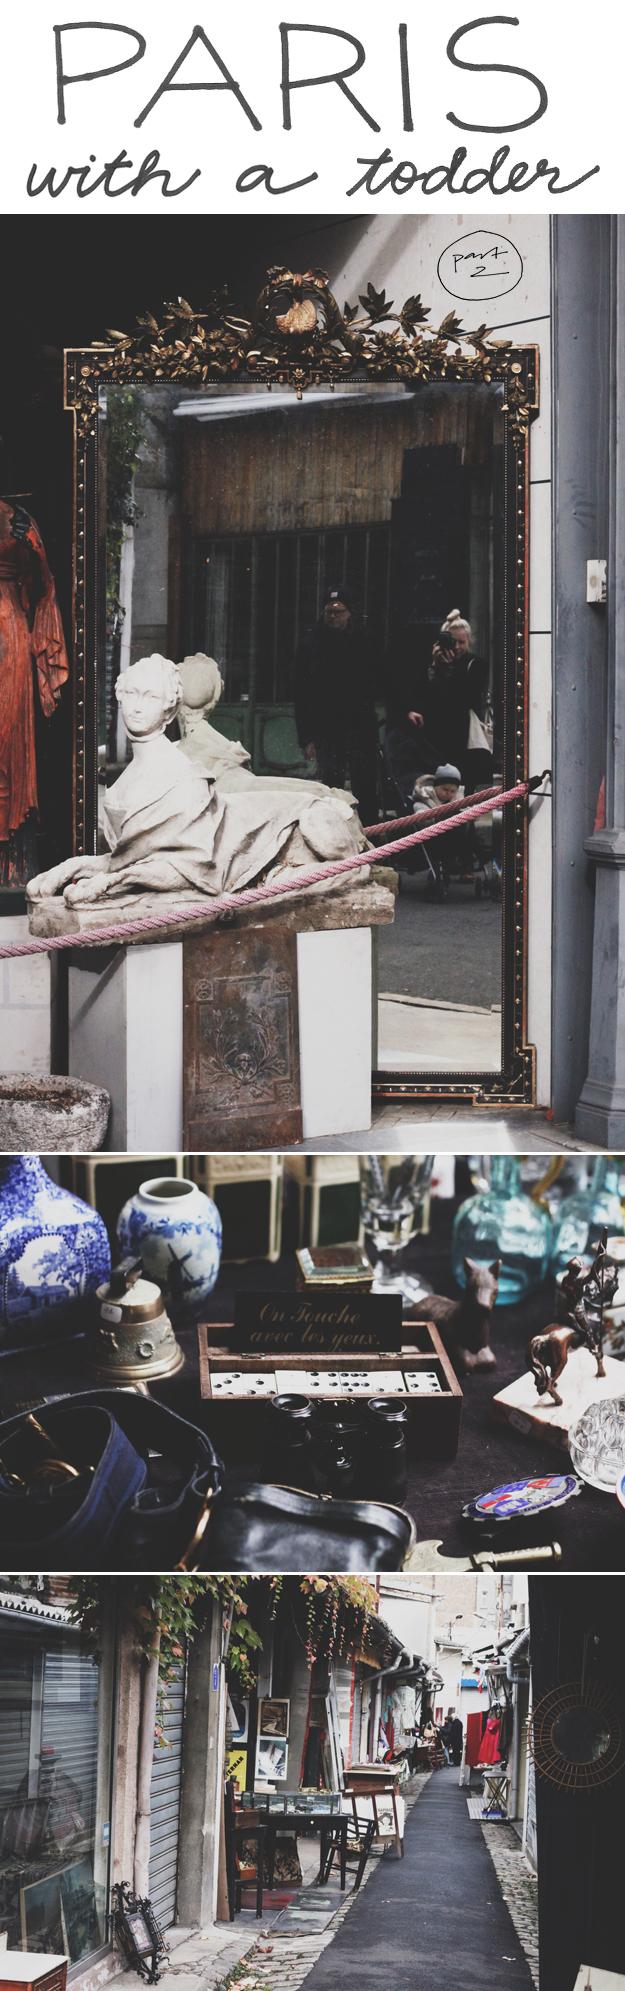 Paris-toddler-flea-market-1.jpg